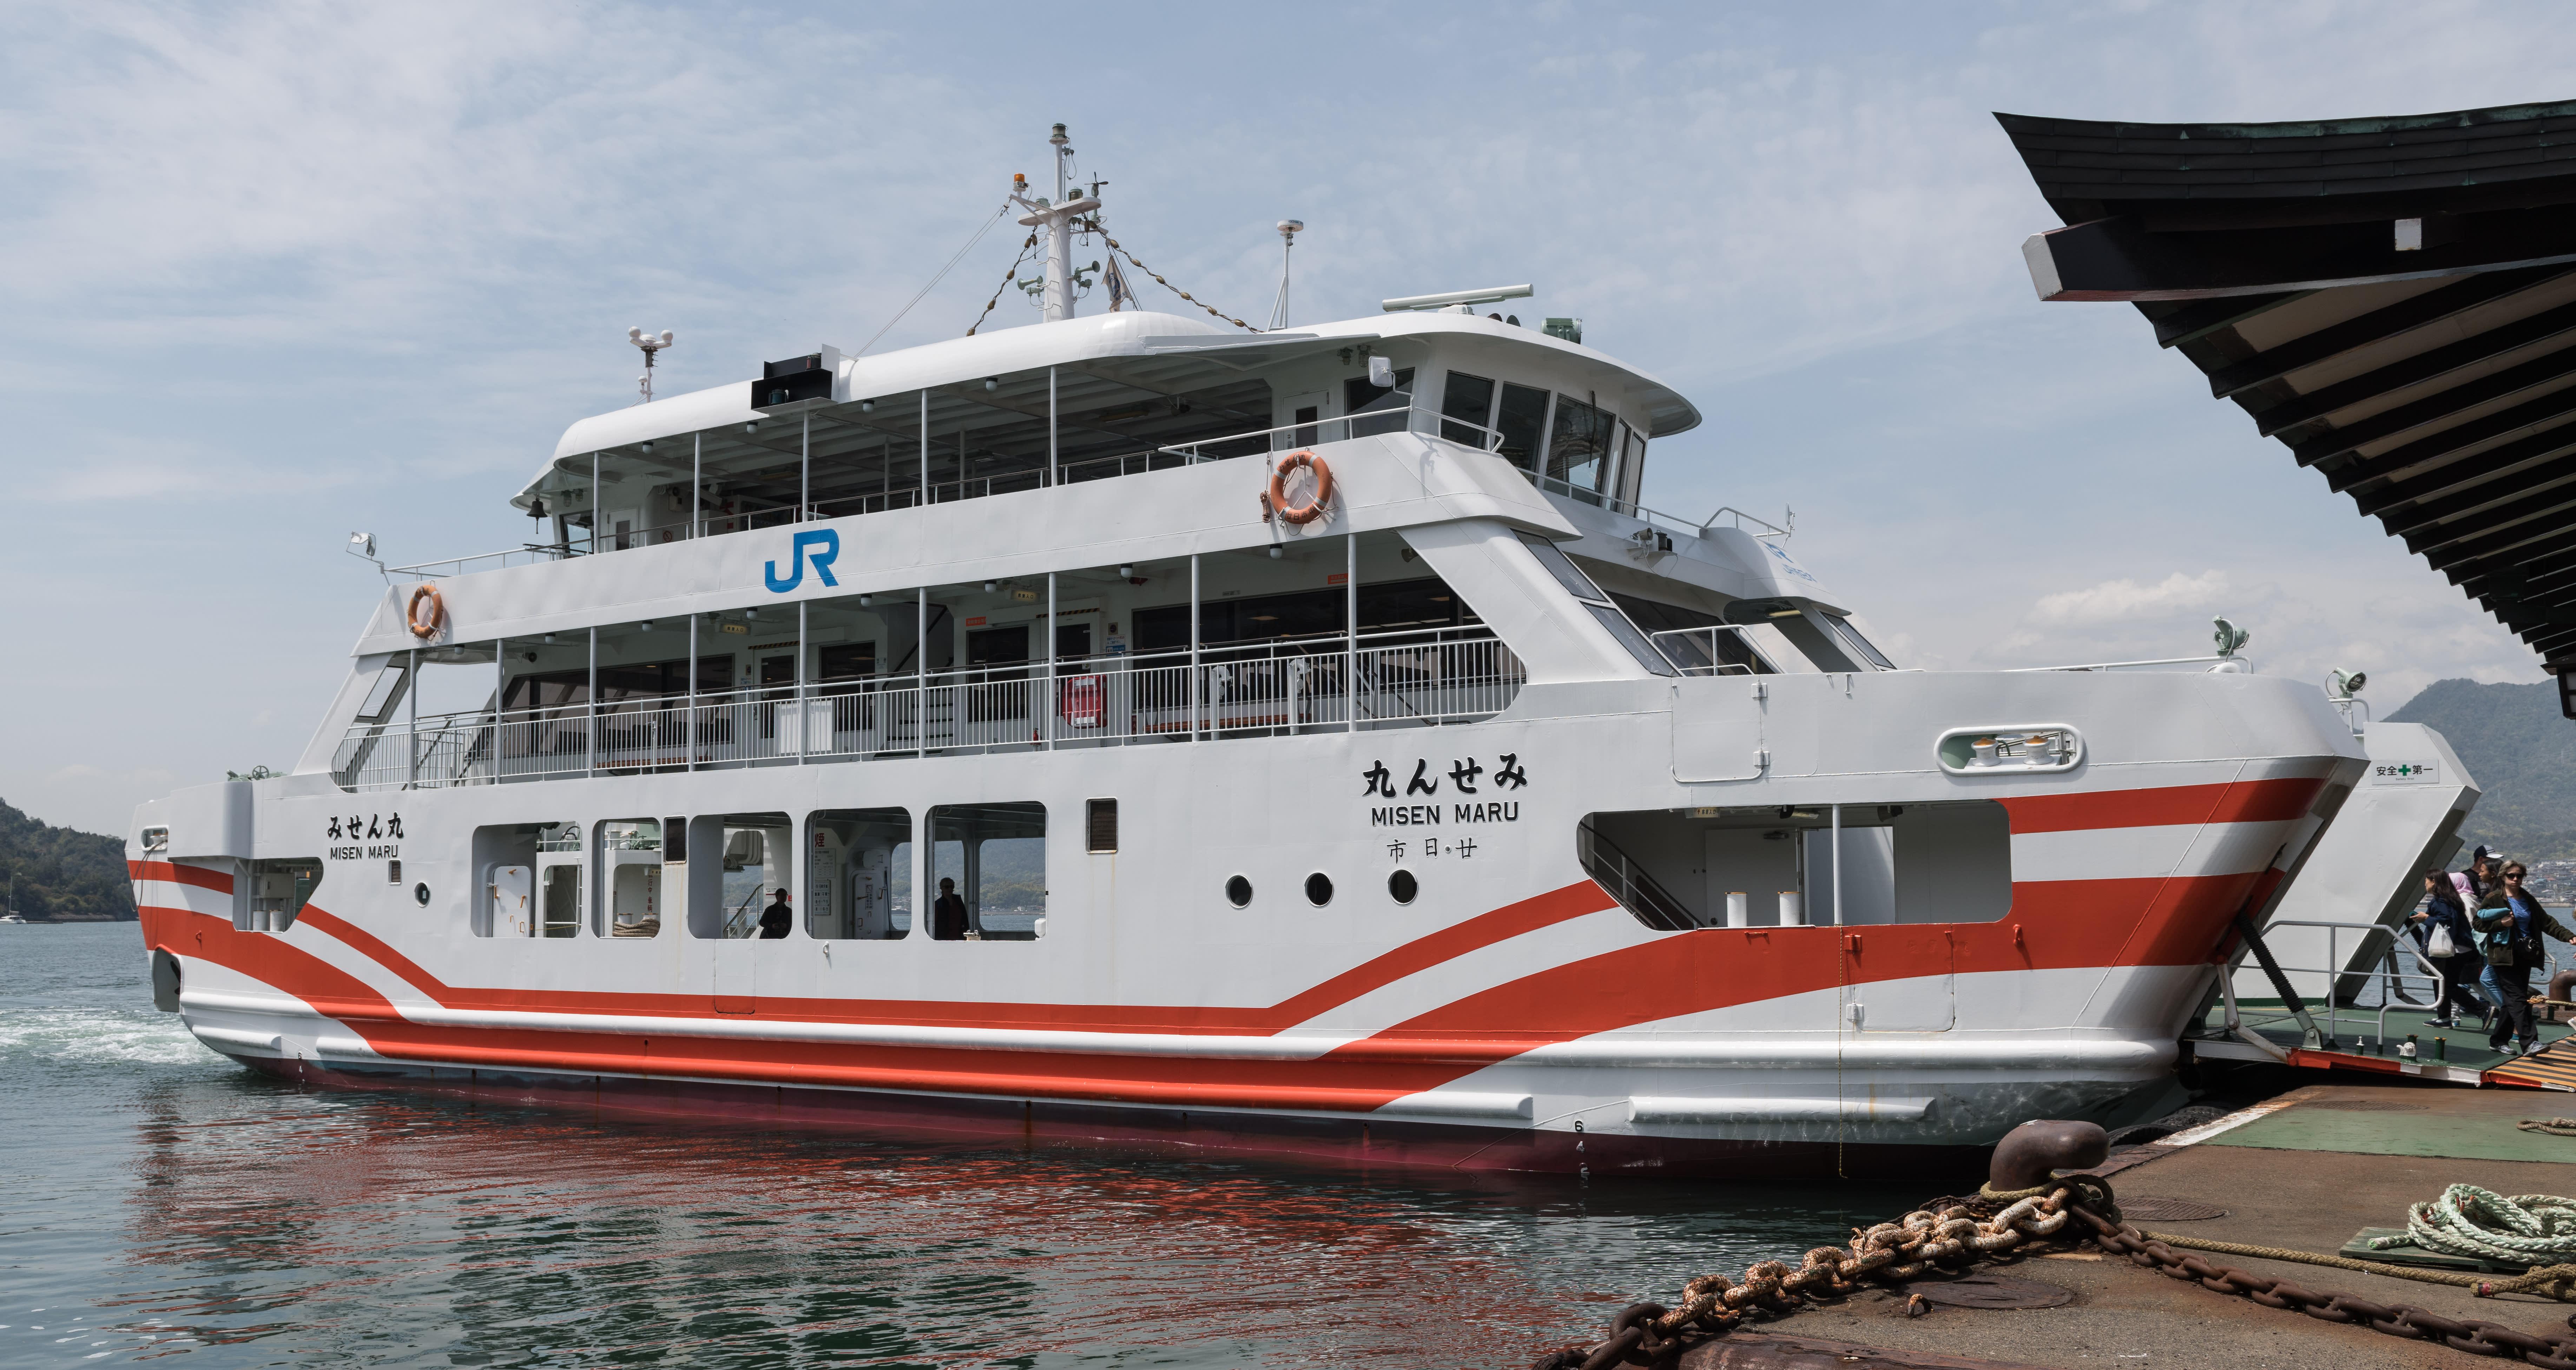 JR West Ferry Misen Maru